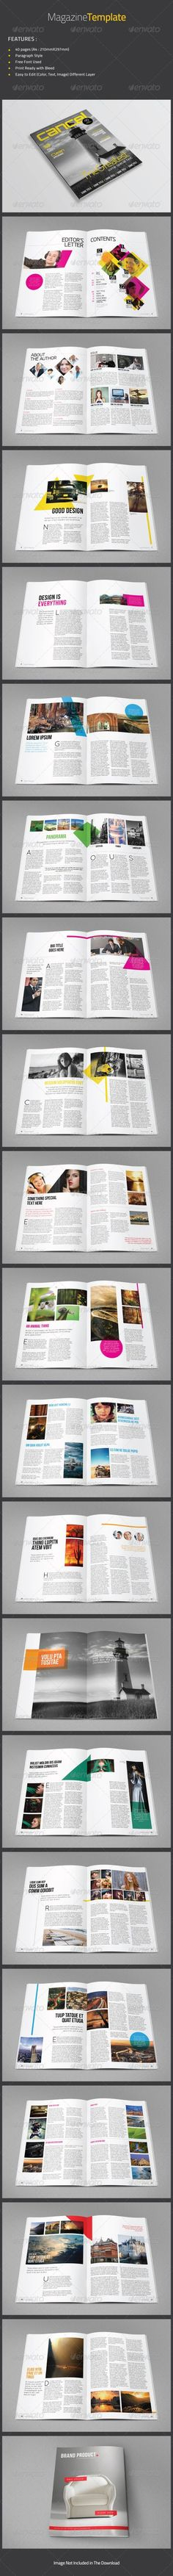 Magazine Template & Design Magazine Template